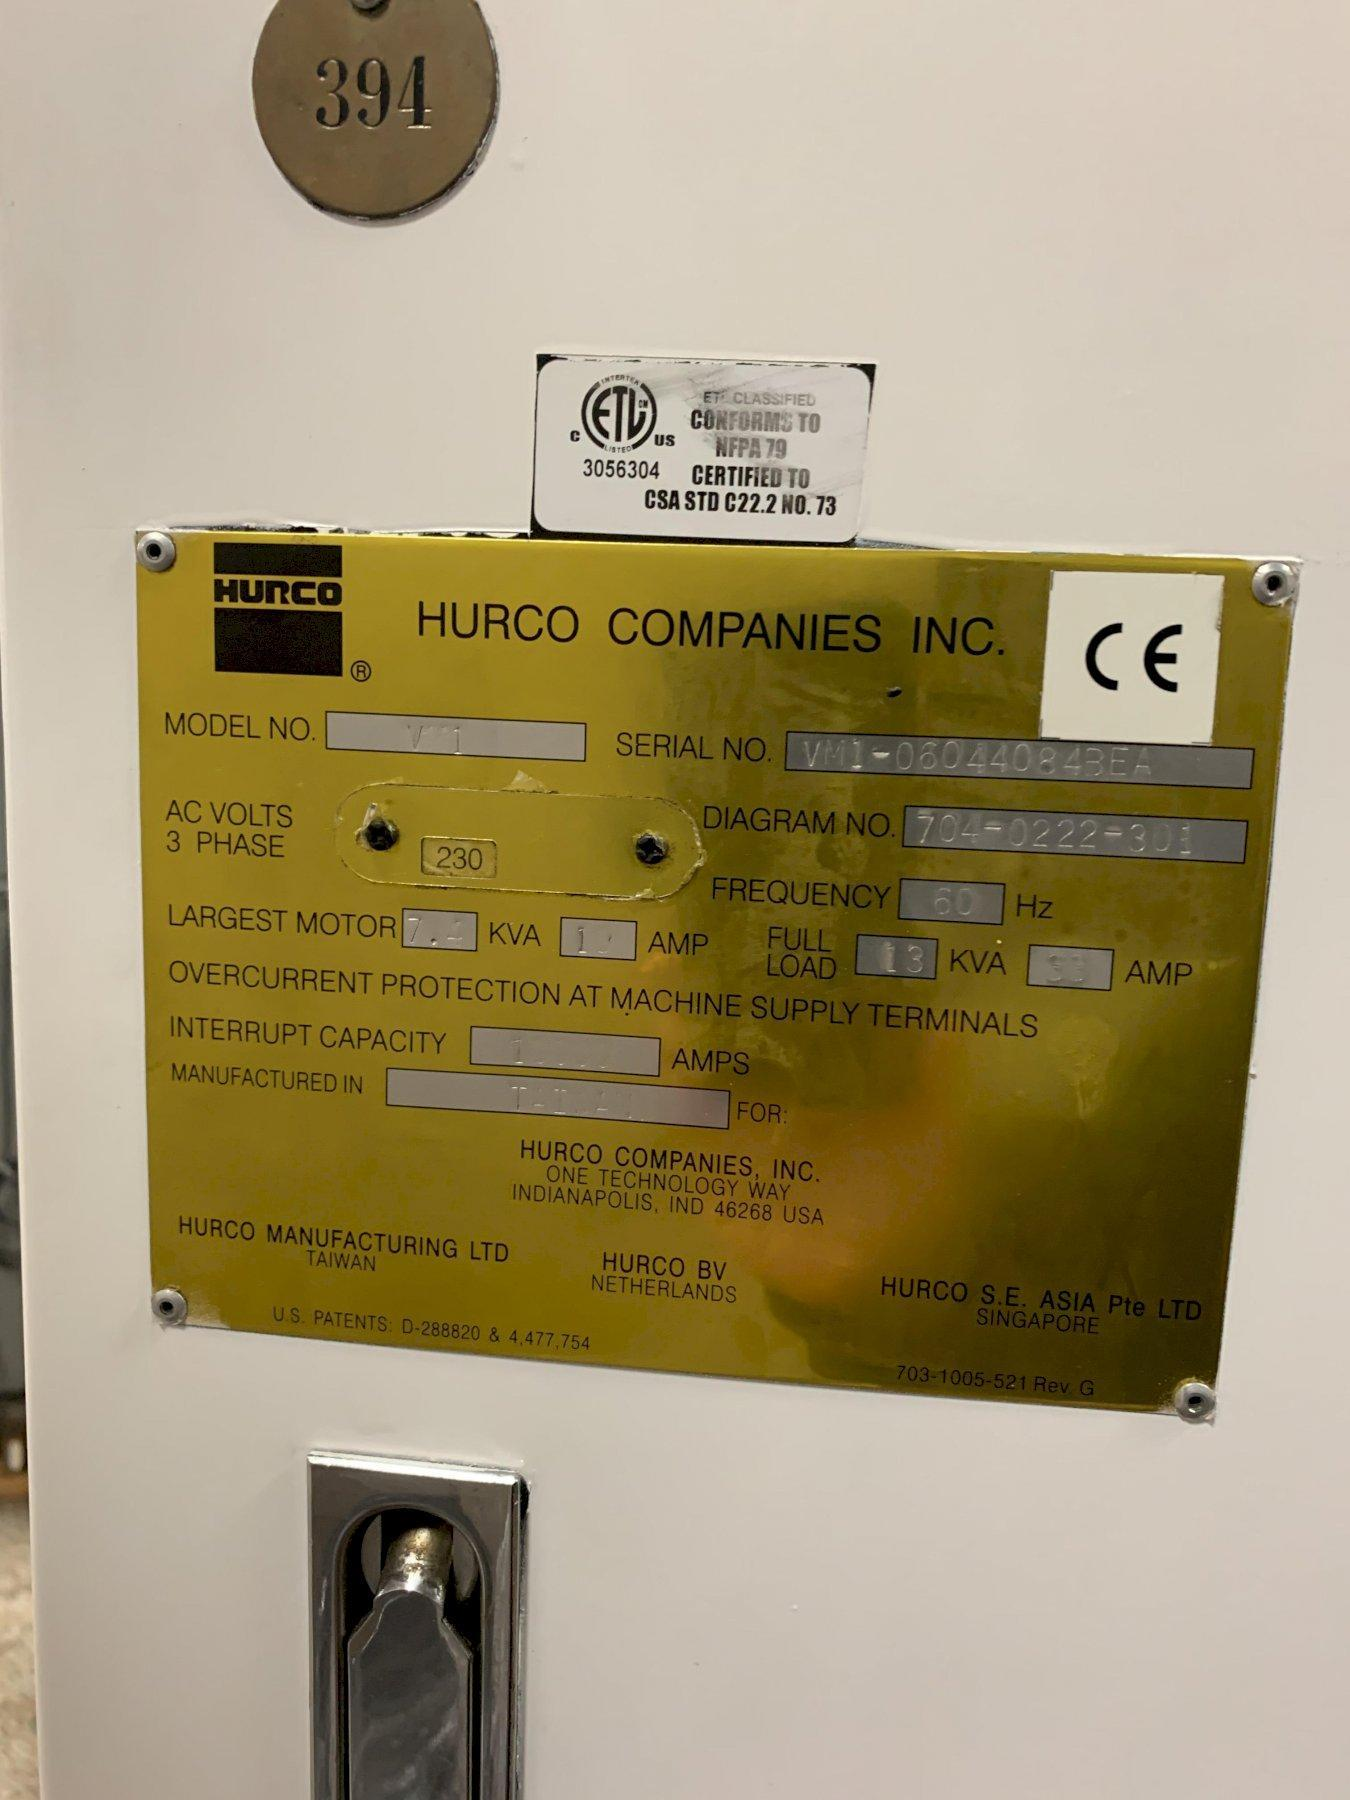 Hurco Model VM1 CNC Vertical Machining Center, New 2004.